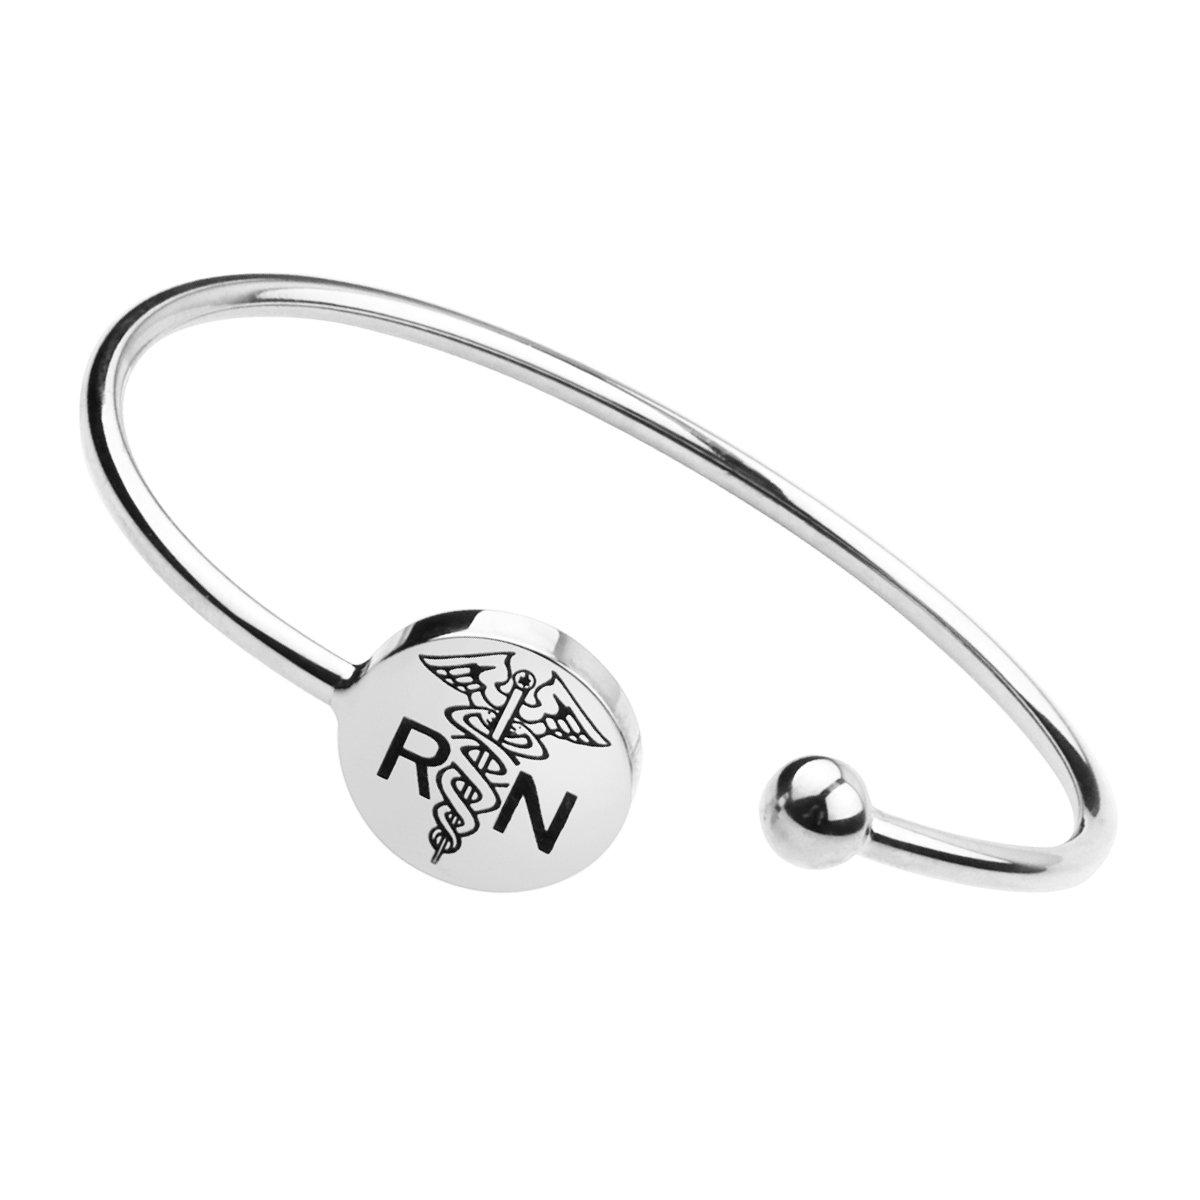 Stethoscope Necklace Jewelry,Nursery Graduation Gift Nurse Bracelet,Heart Beat Bracelet Hospital Nurse Doctor Gifts